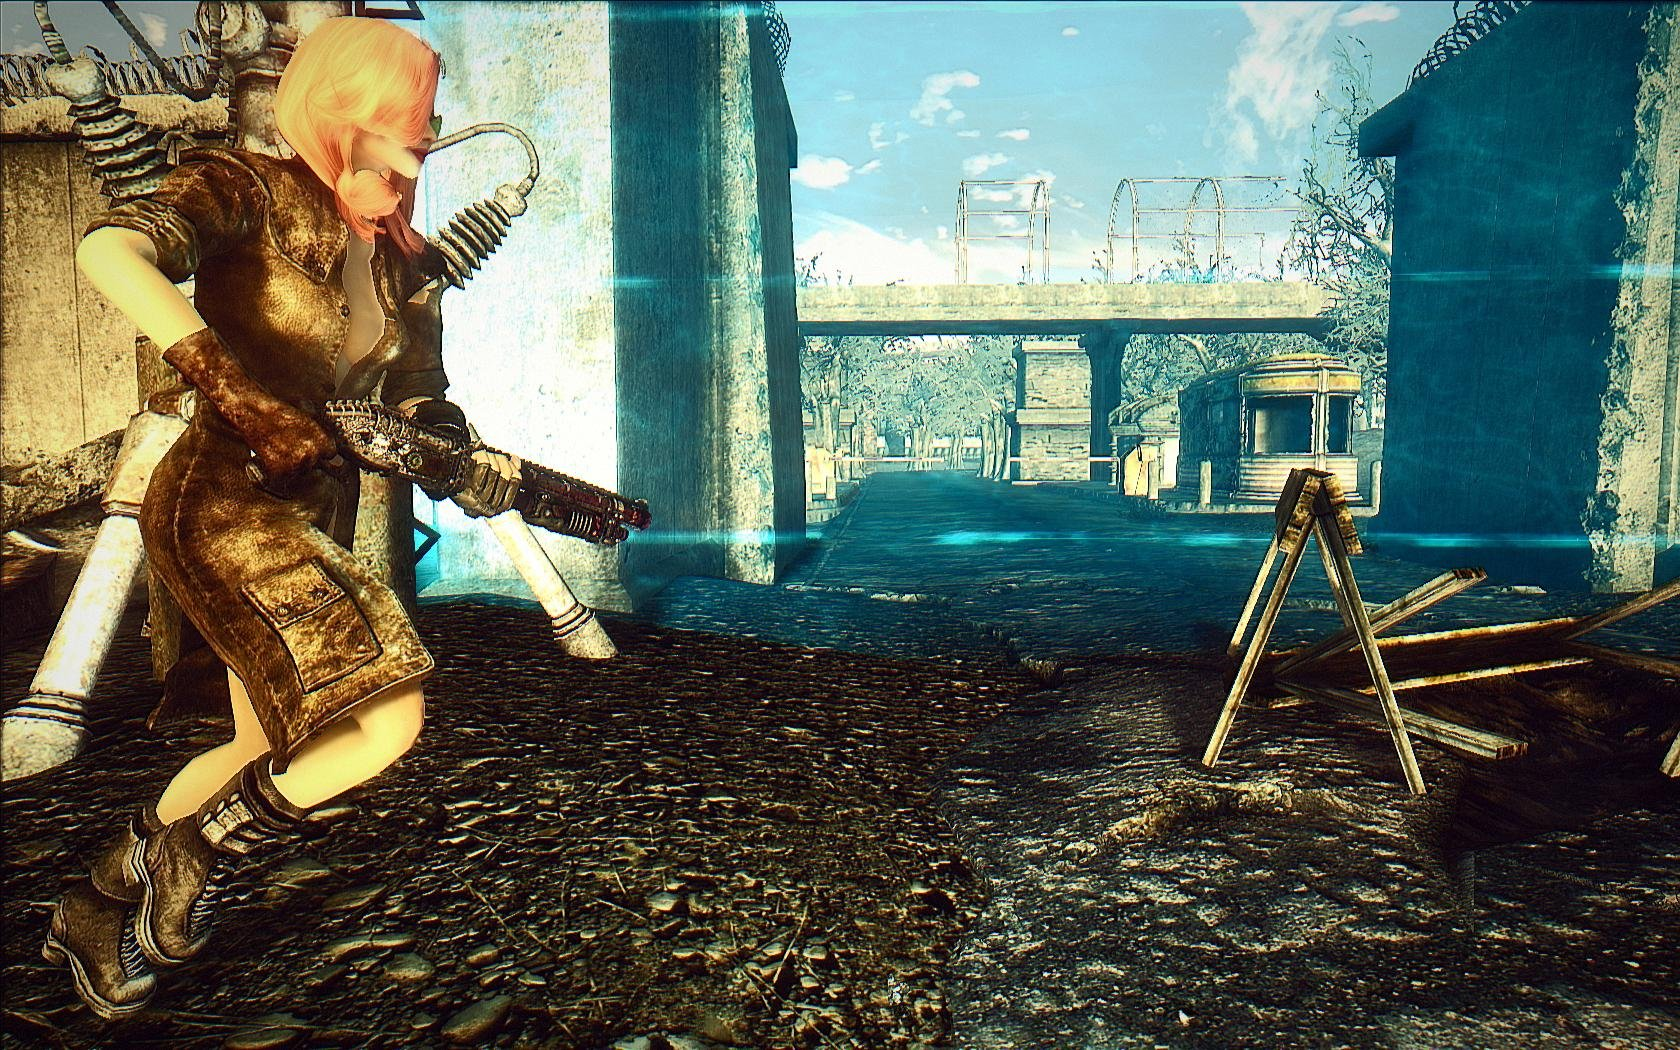 Fallout3 2019-06-17 11-56-45-98